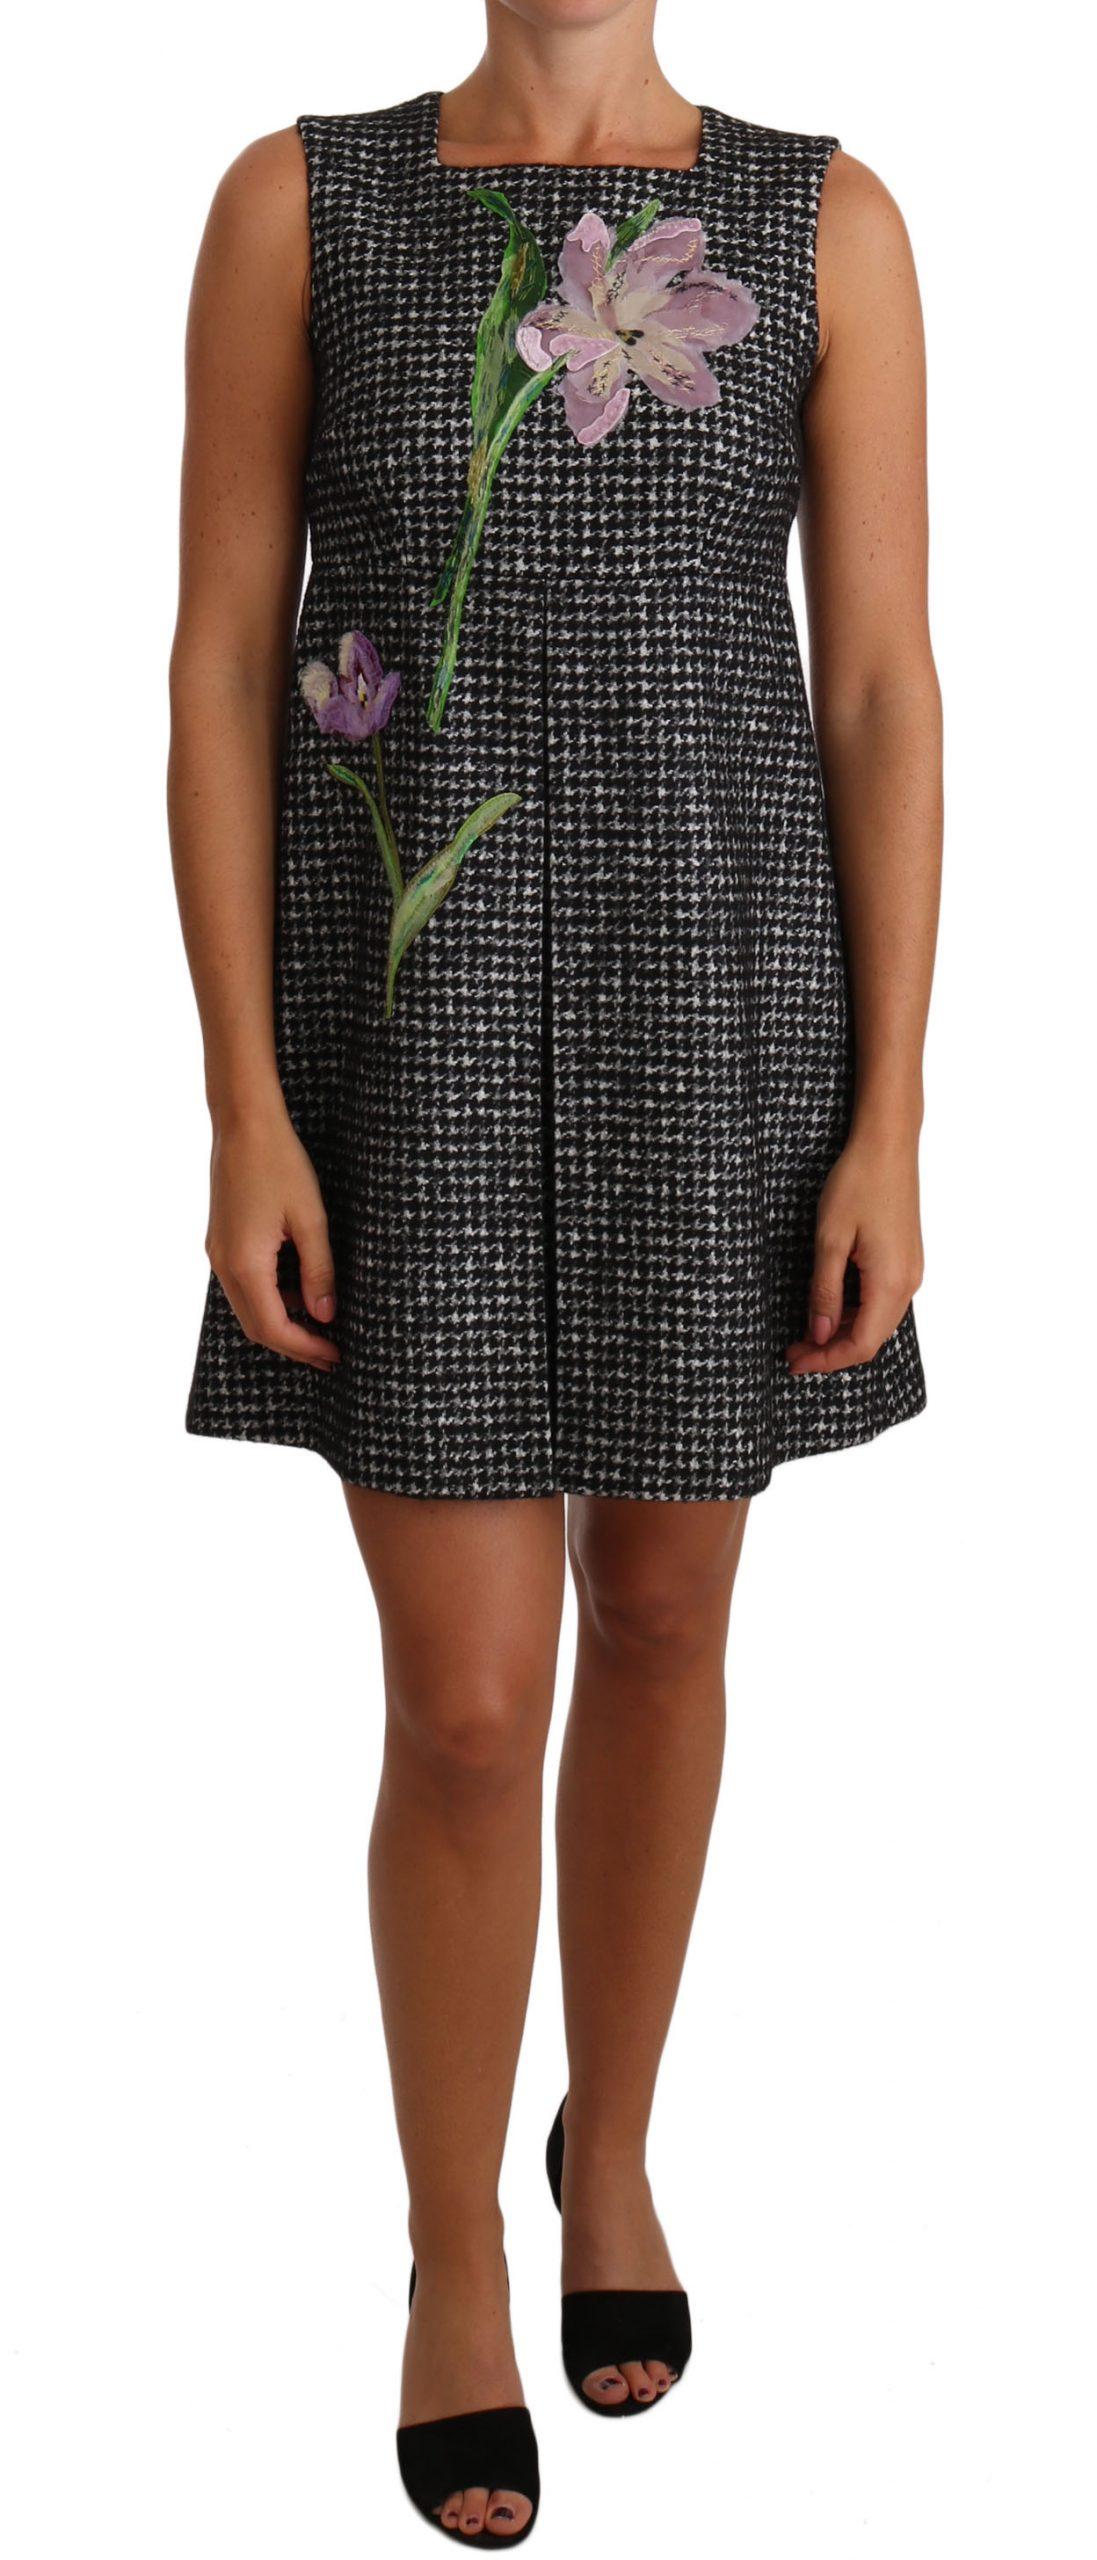 Dolce & Gabbana Women's Houndstooth Floral Appliqué Mini Dress Gray DR1439 - IT40|S